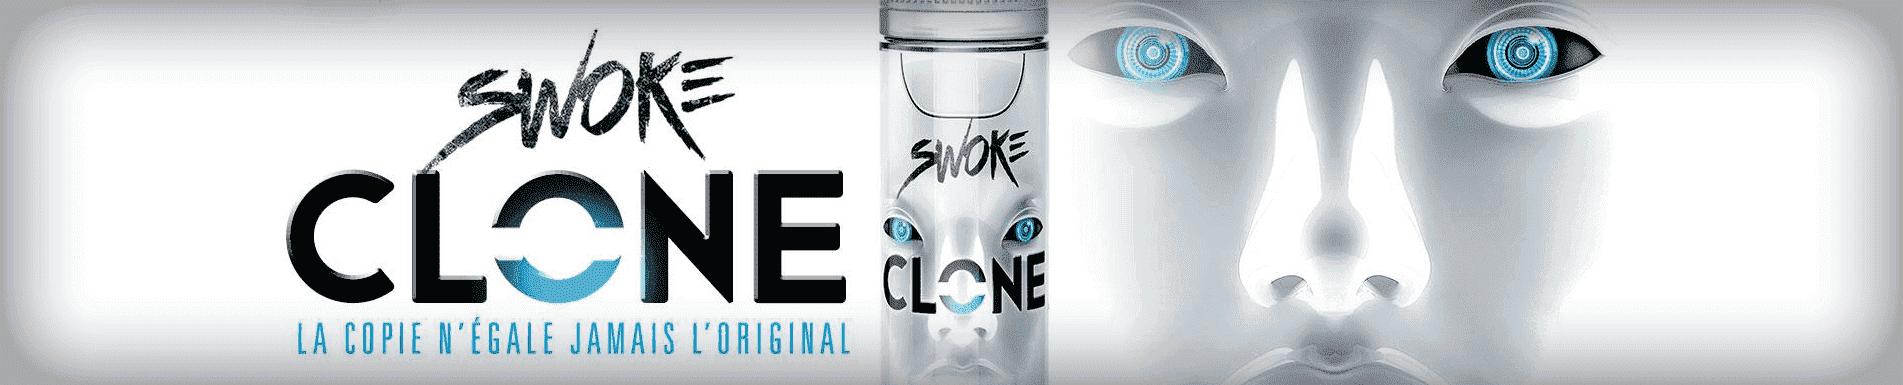 E-liquide Clone 50 mL Mix'n'Vape par Swoke